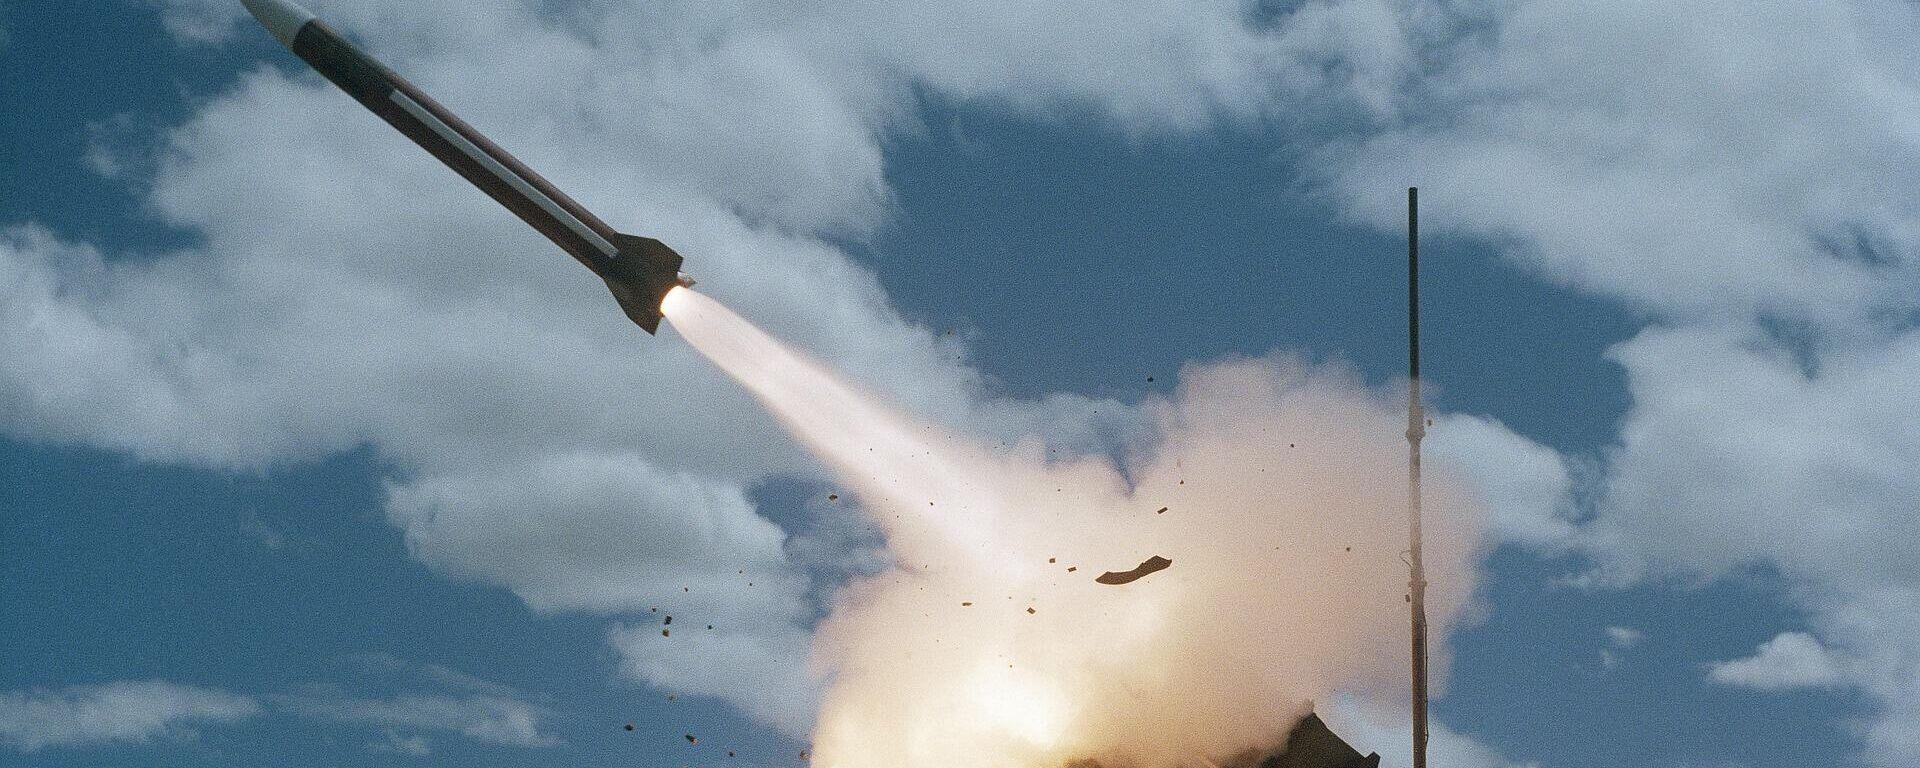 Rakete (symbolbild) - SNA, 1920, 03.07.2021